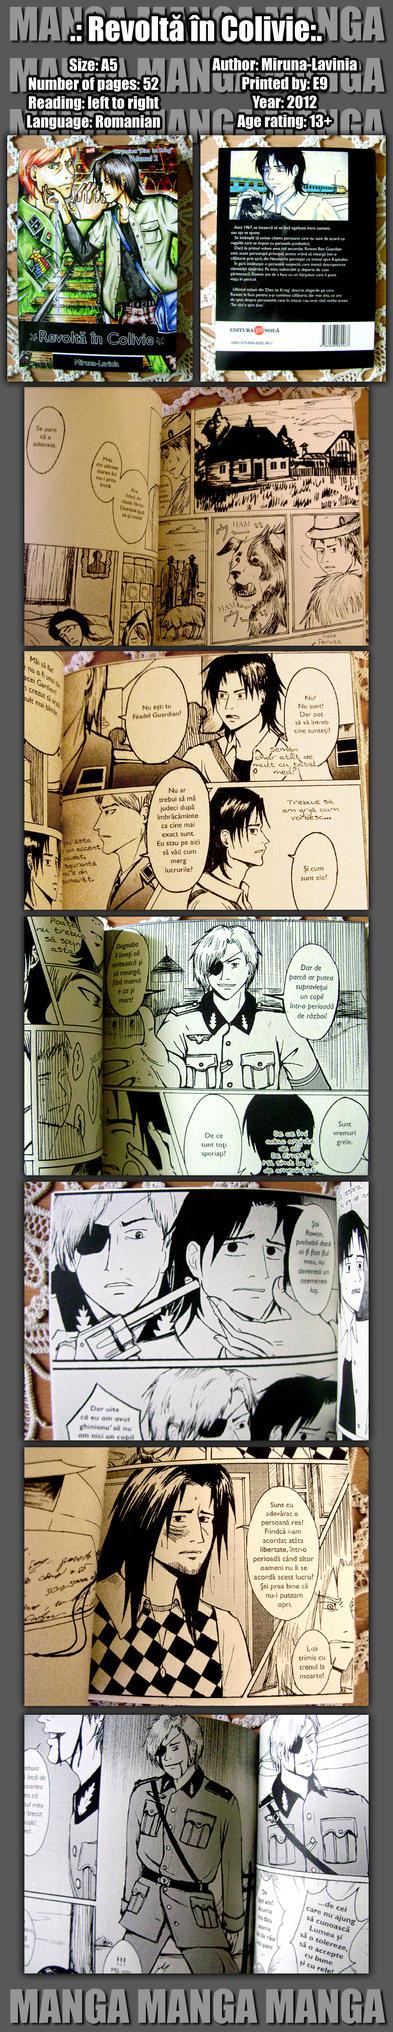 Dies ist Krieg manga vol2 by Miruna-Lavinia